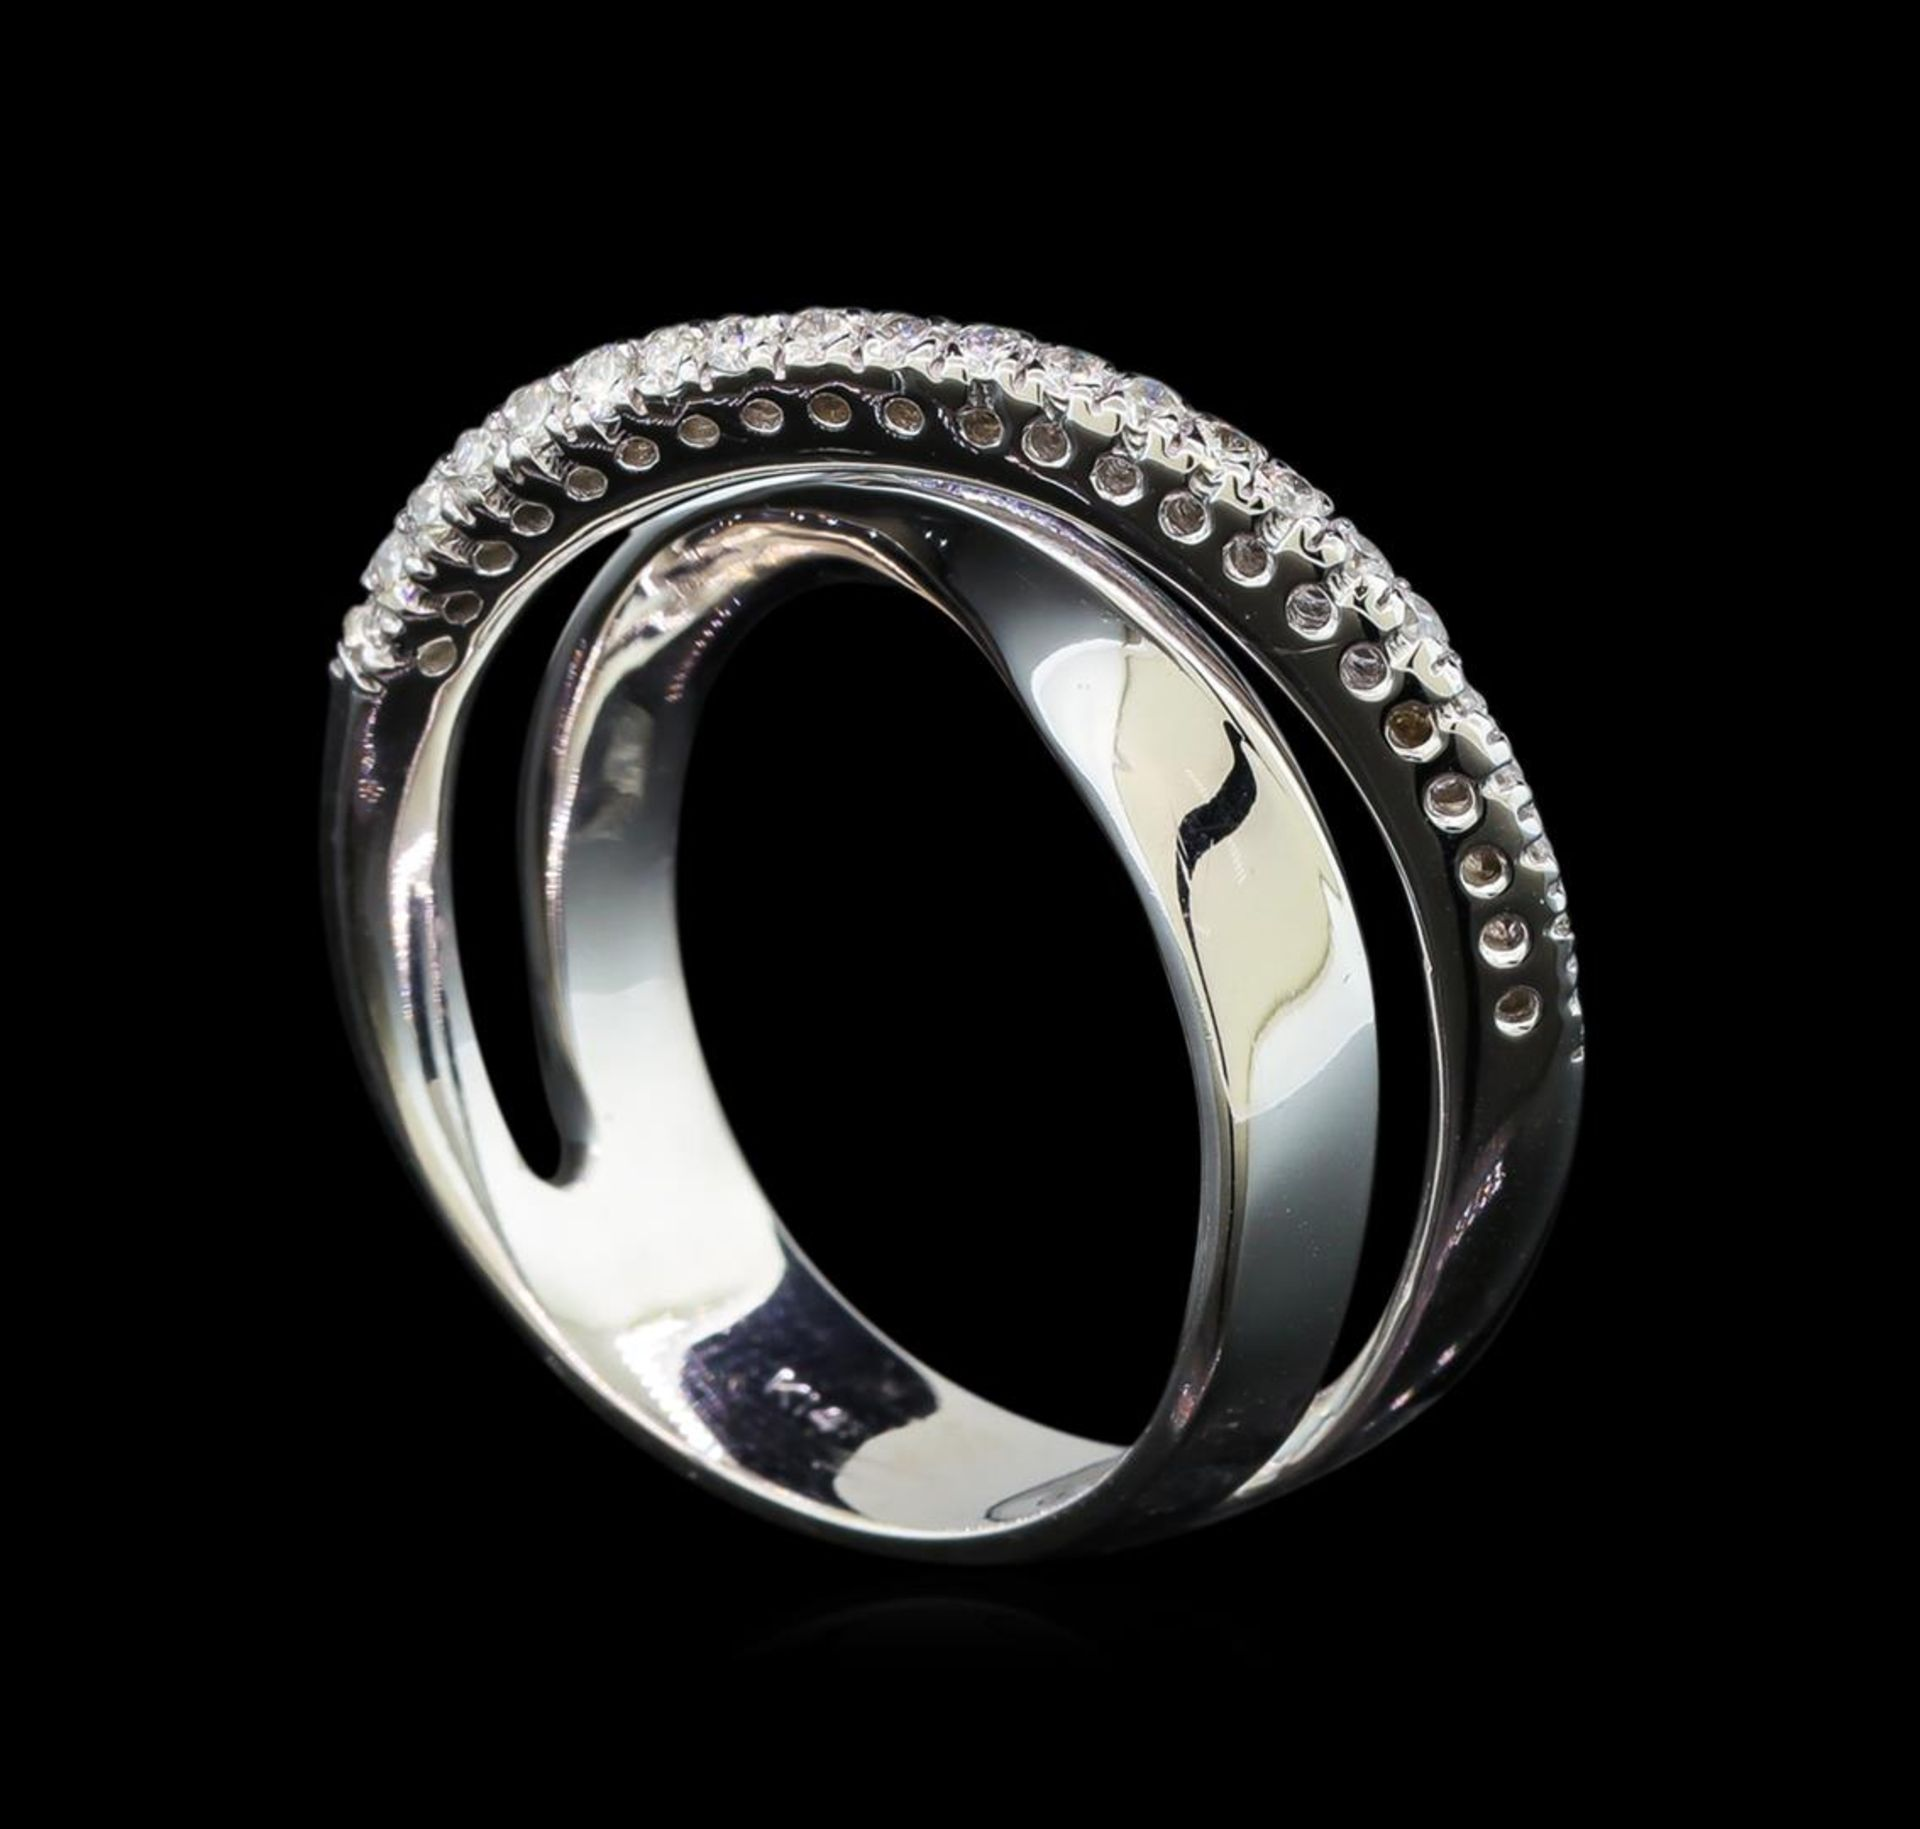 0.25 ctw Diamond Ring - 14KT White Gold - Image 3 of 3